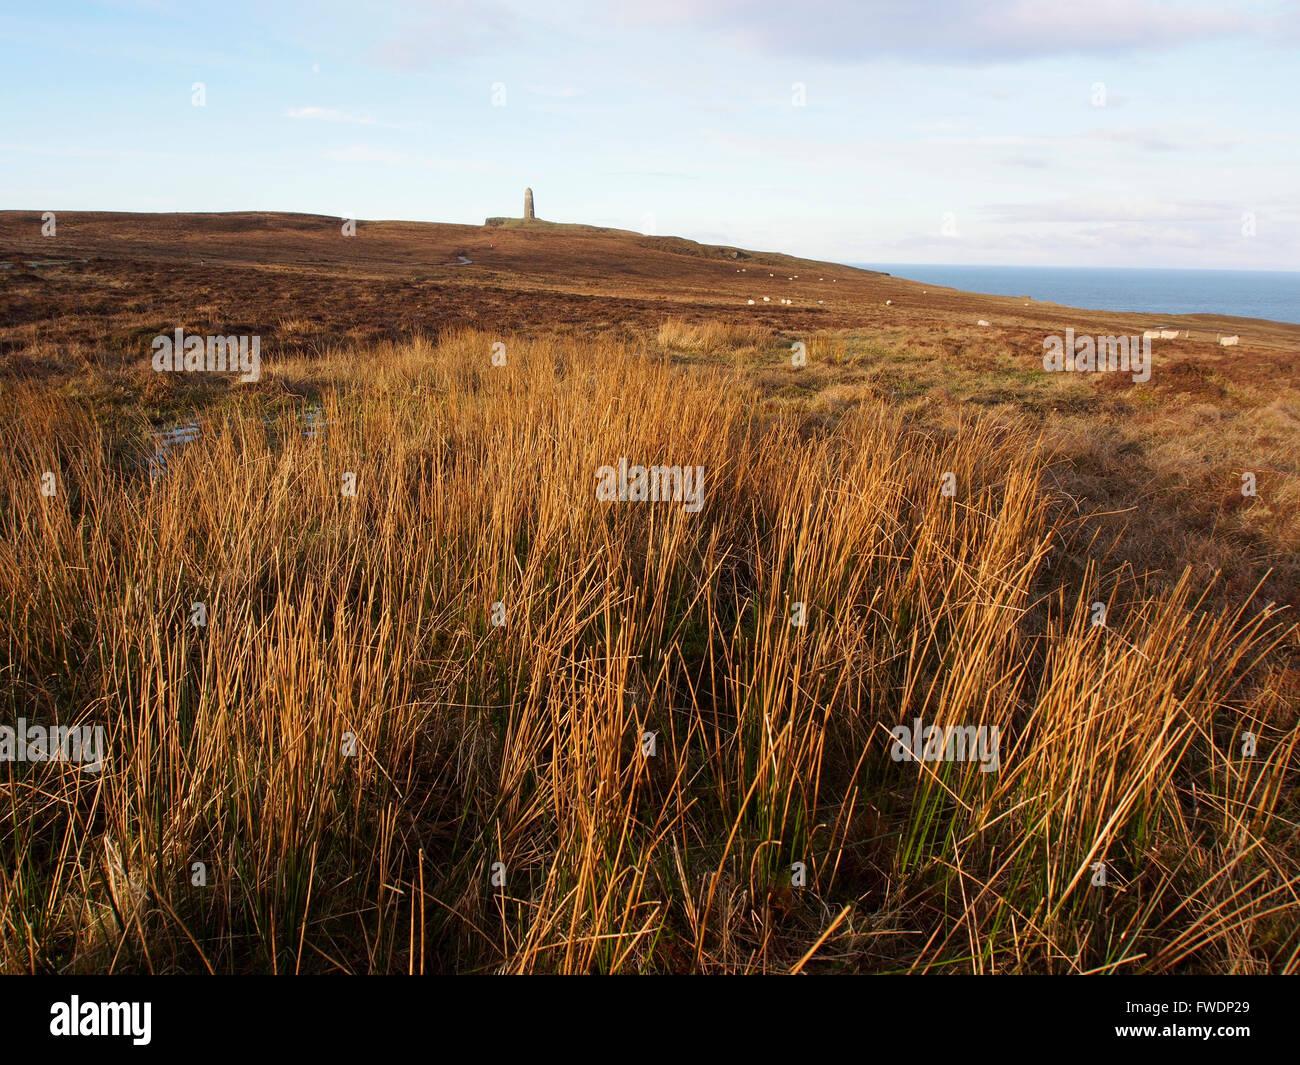 American monument, Mull of Oa, Islay, Scotland Stock Photo